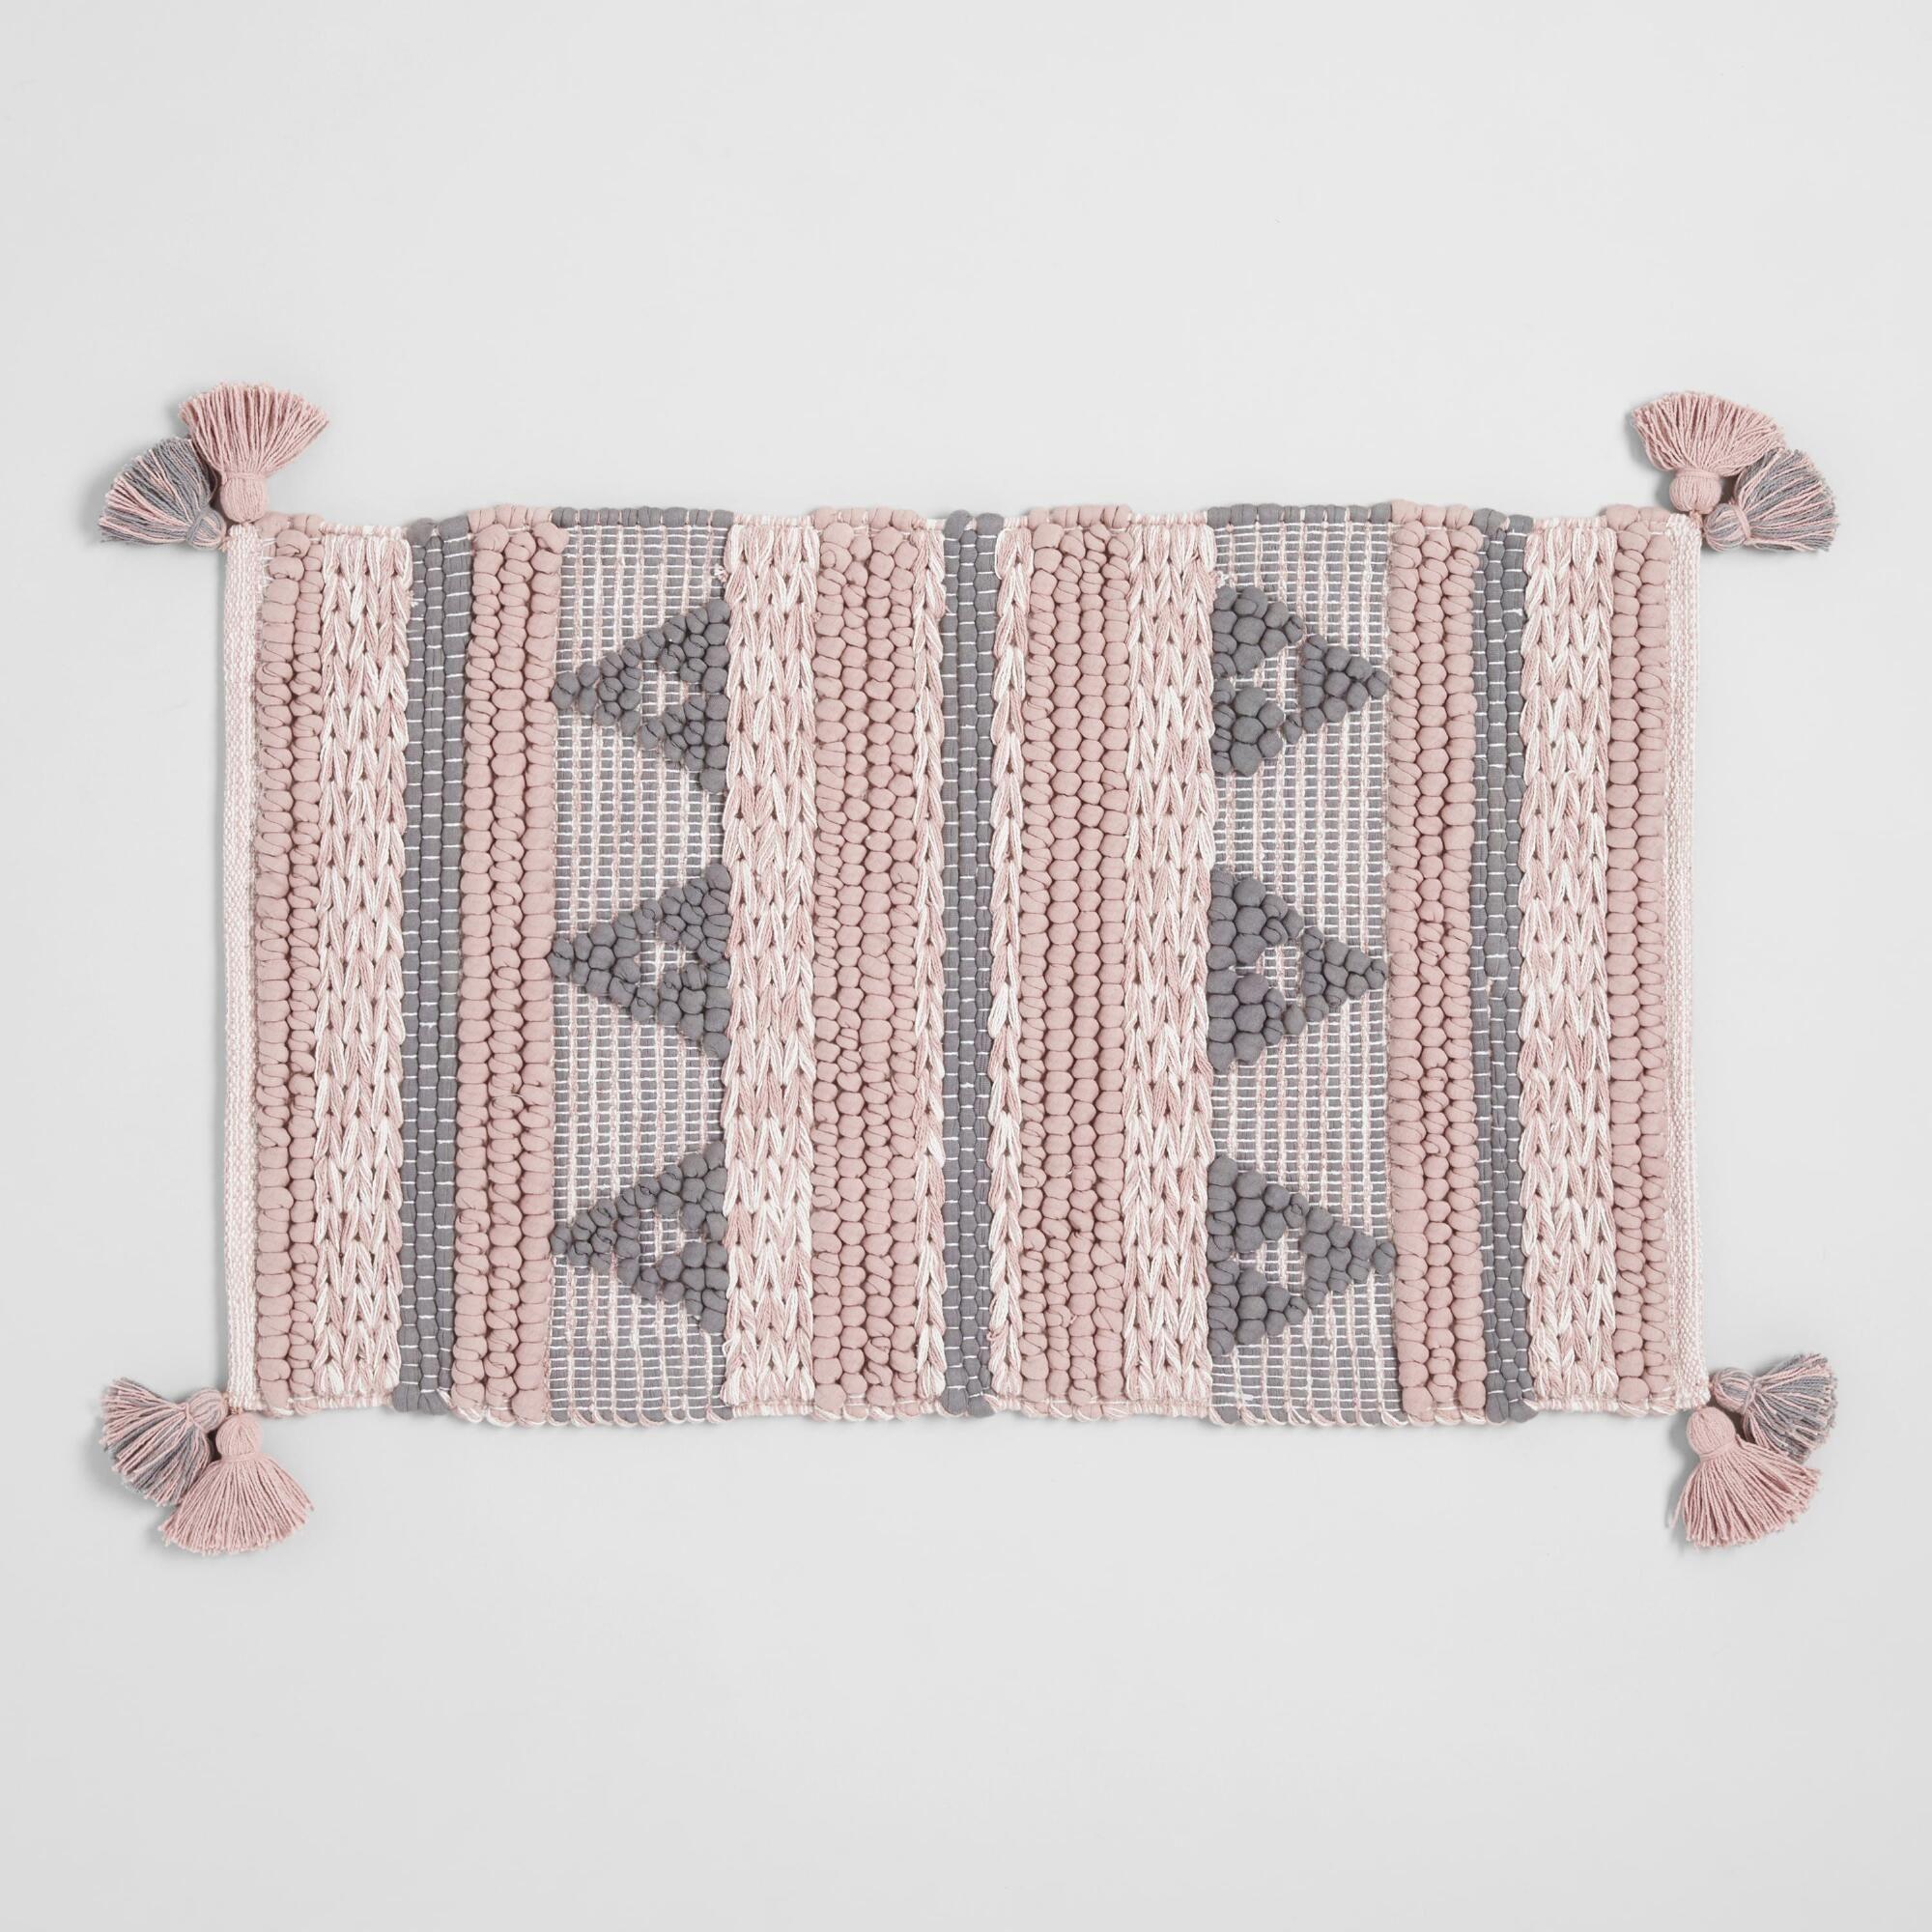 Blush And Gray Geometric Chunky Tassel Bath Mat Pink Cotton By World Market Blush And Grey Bath Rugs Sets Bath Rugs